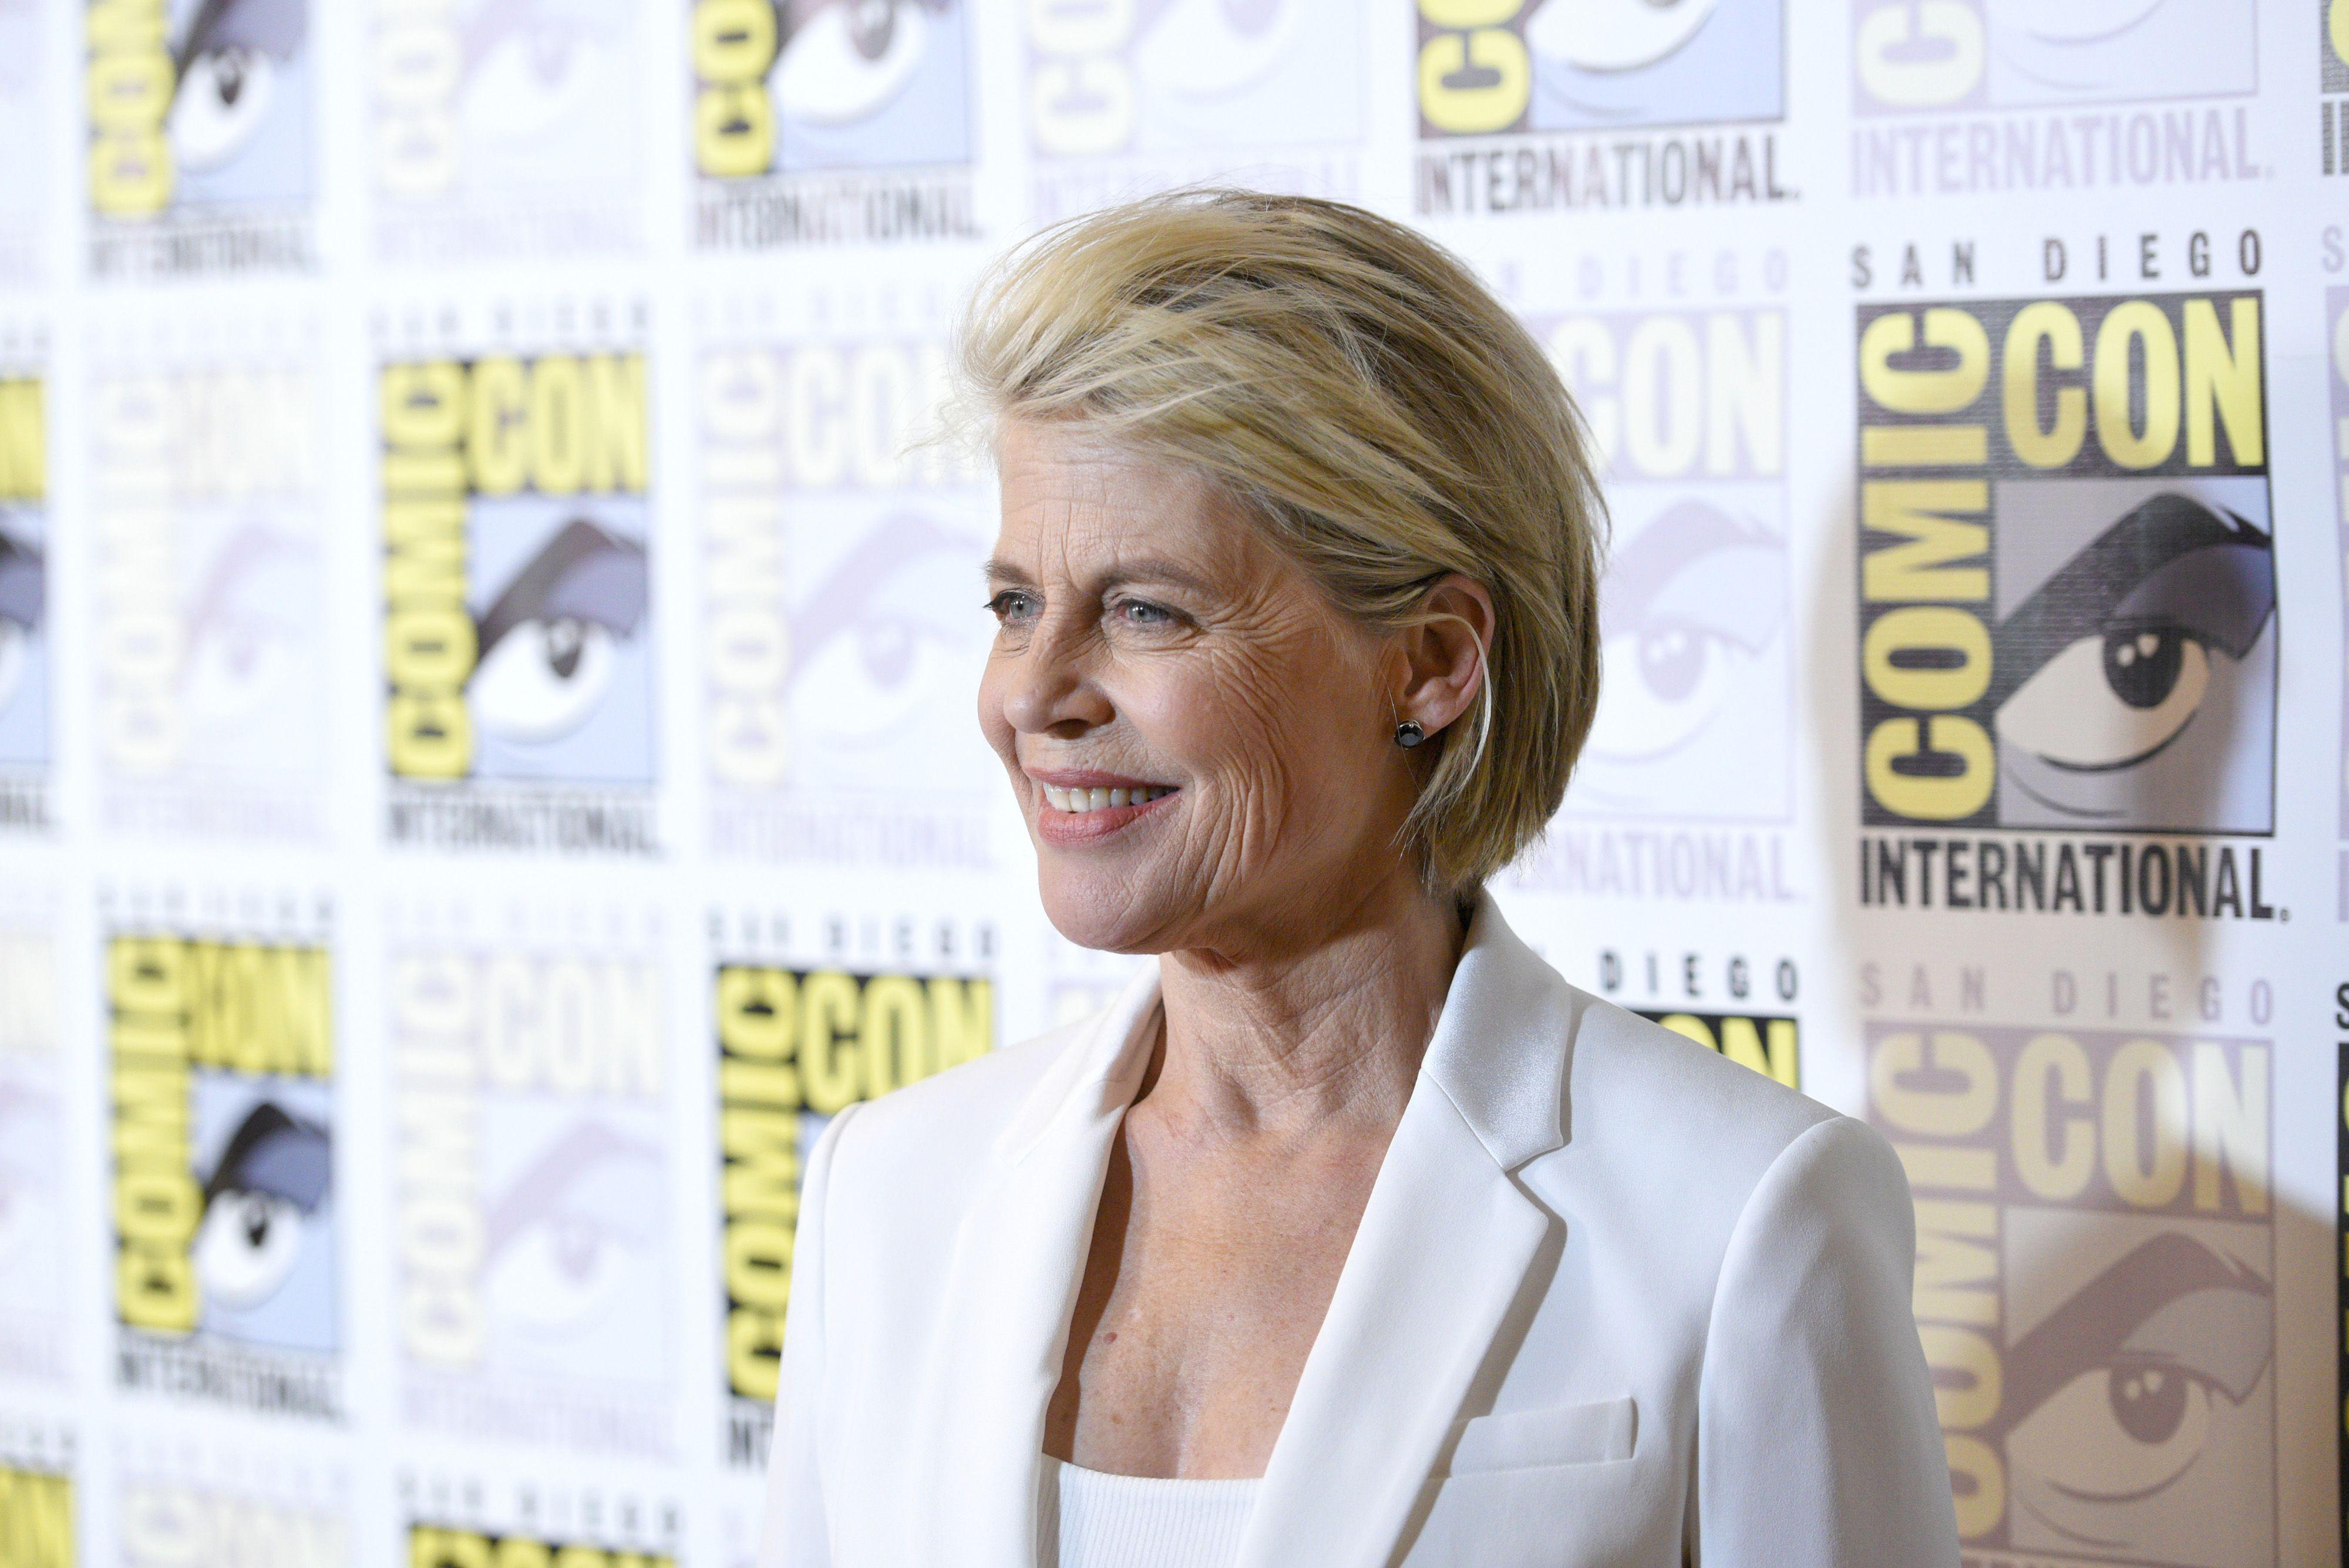 Terminator' Star Linda Hamilton Has Been Celibate for 15 Years